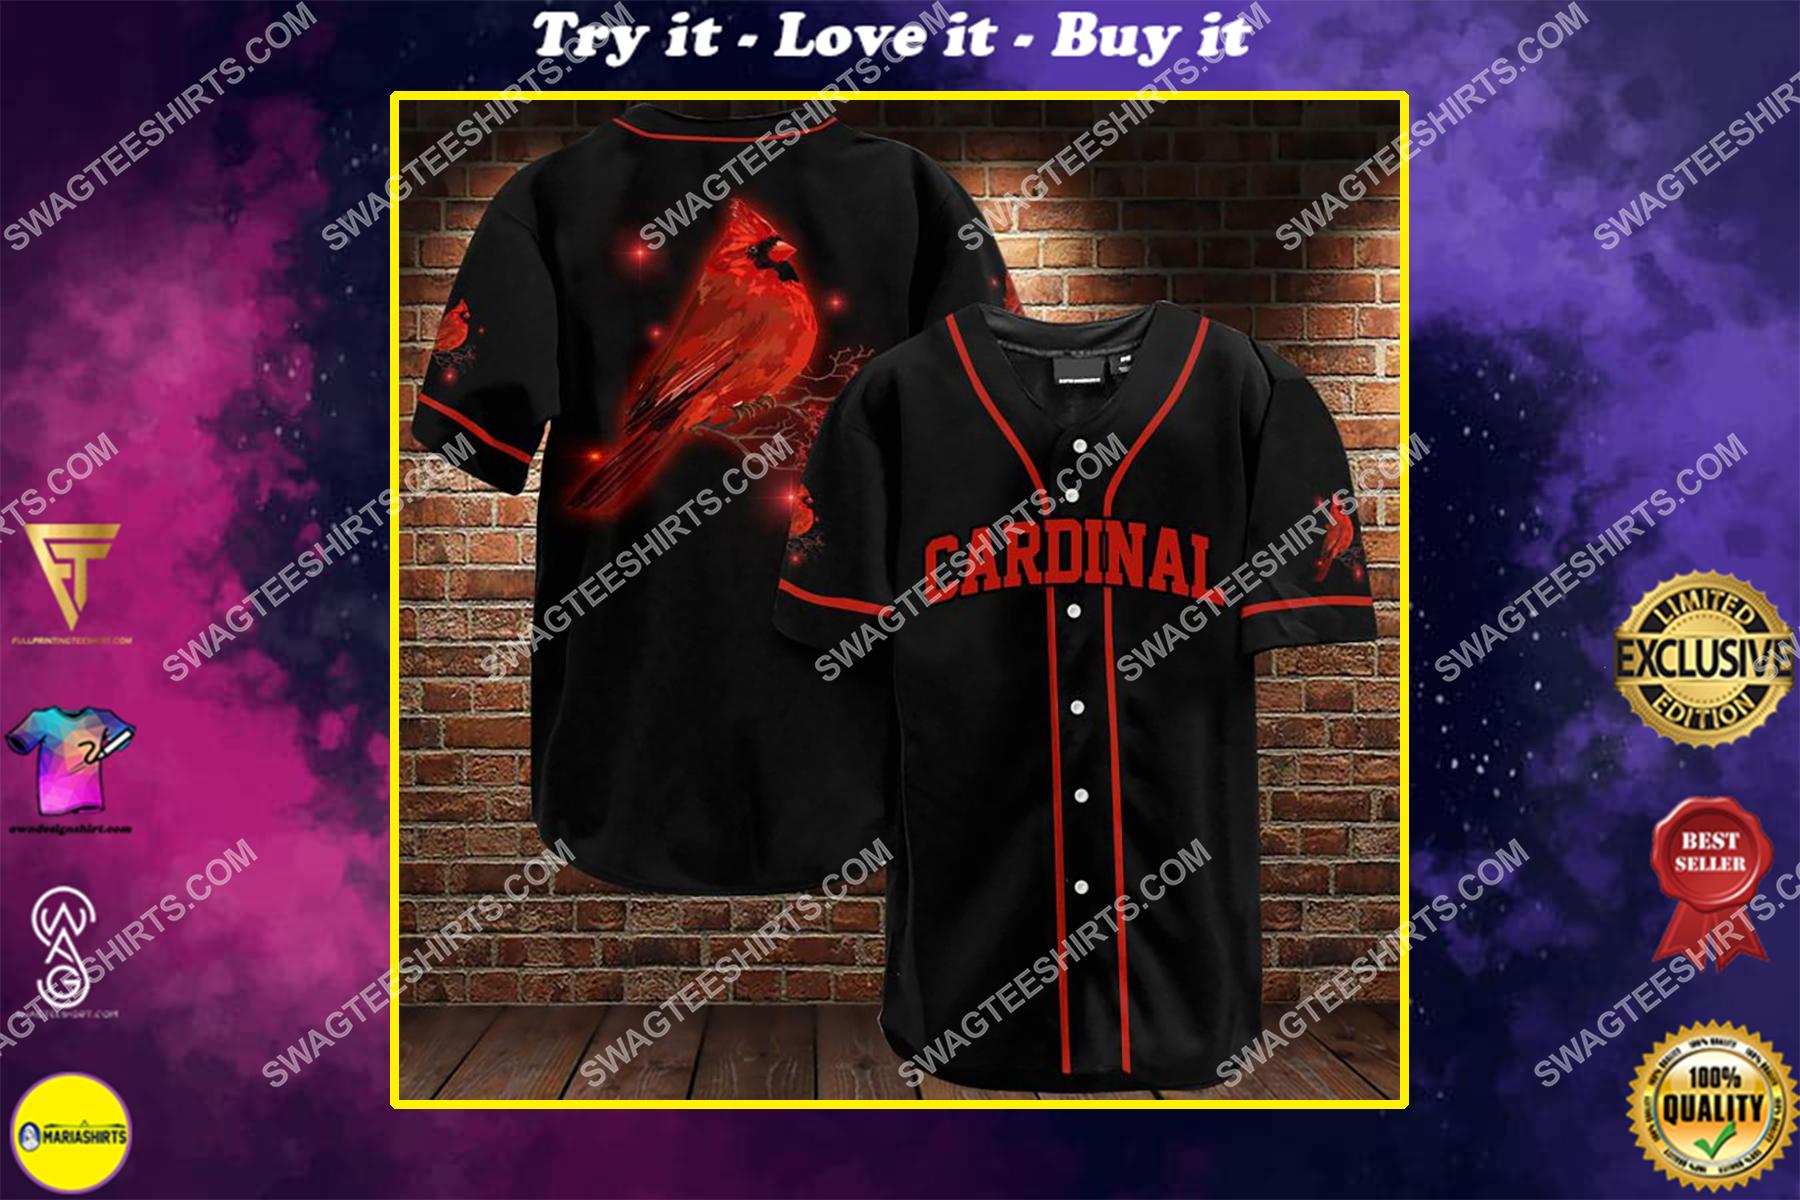 st louis cardinals full printing baseball shirt